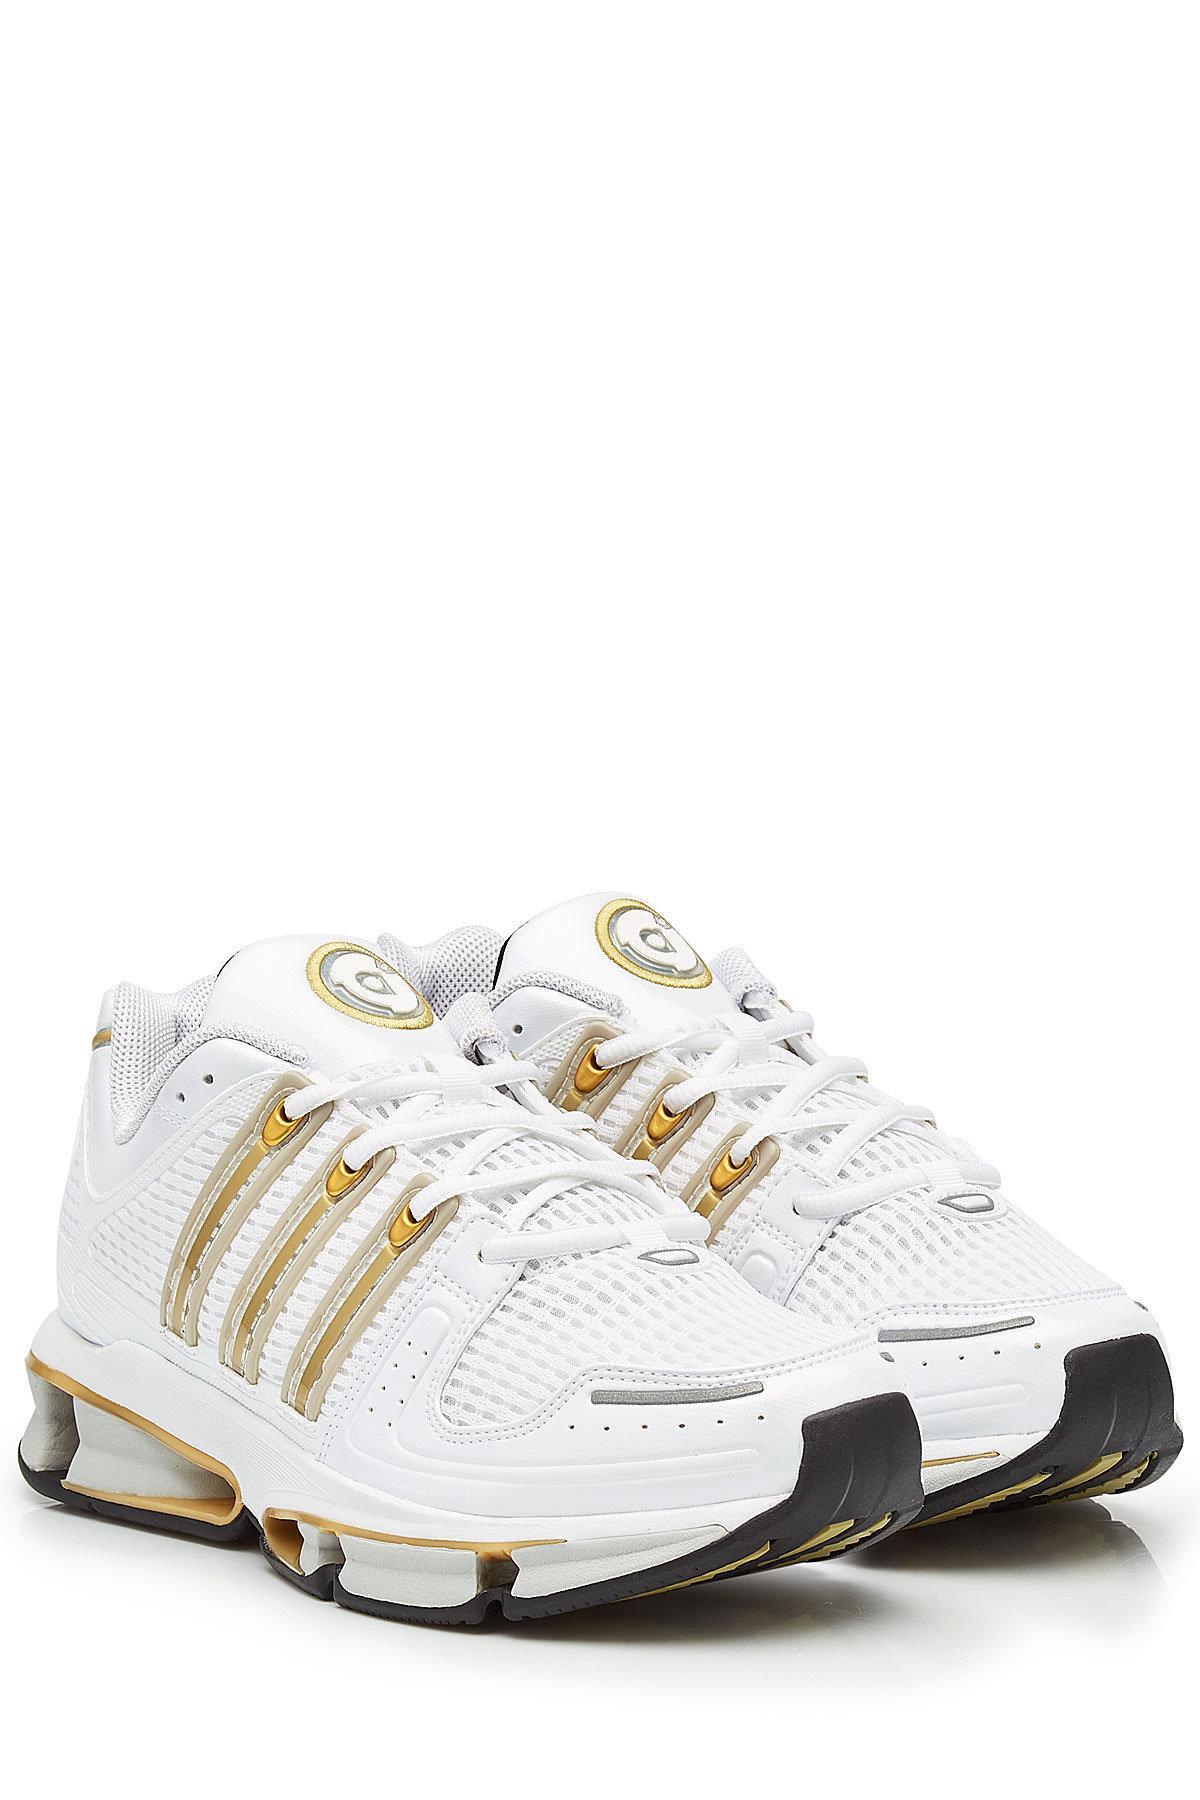 meet e2996 294f7 Lyst - adidas Originals A3 Twinstrike Sneakers for Men